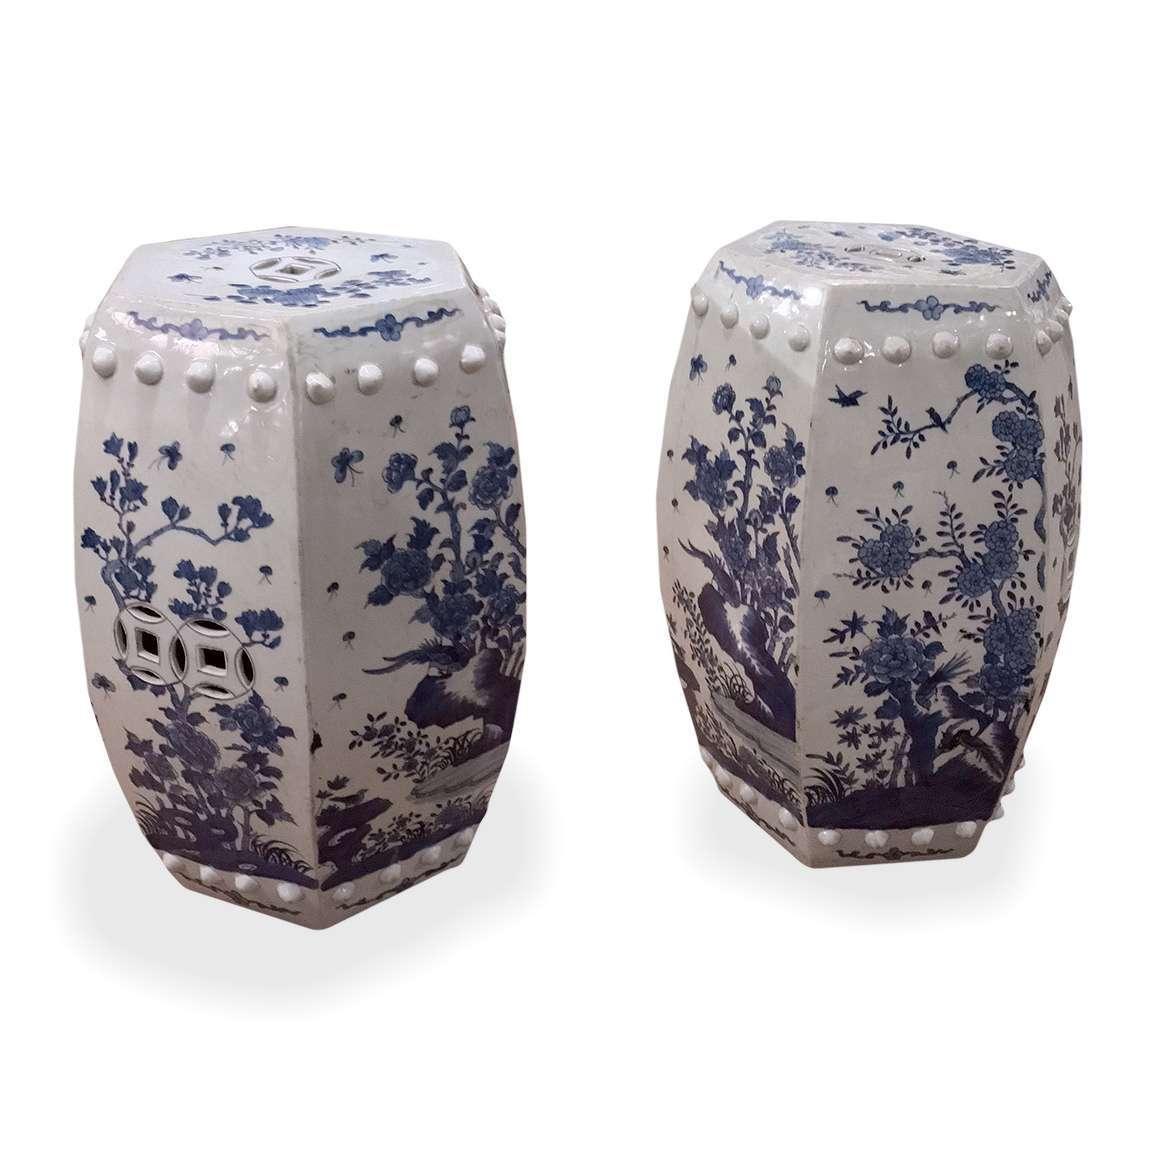 3073 – Pair of Chinese Hexagonal Blue and White Garden Seats